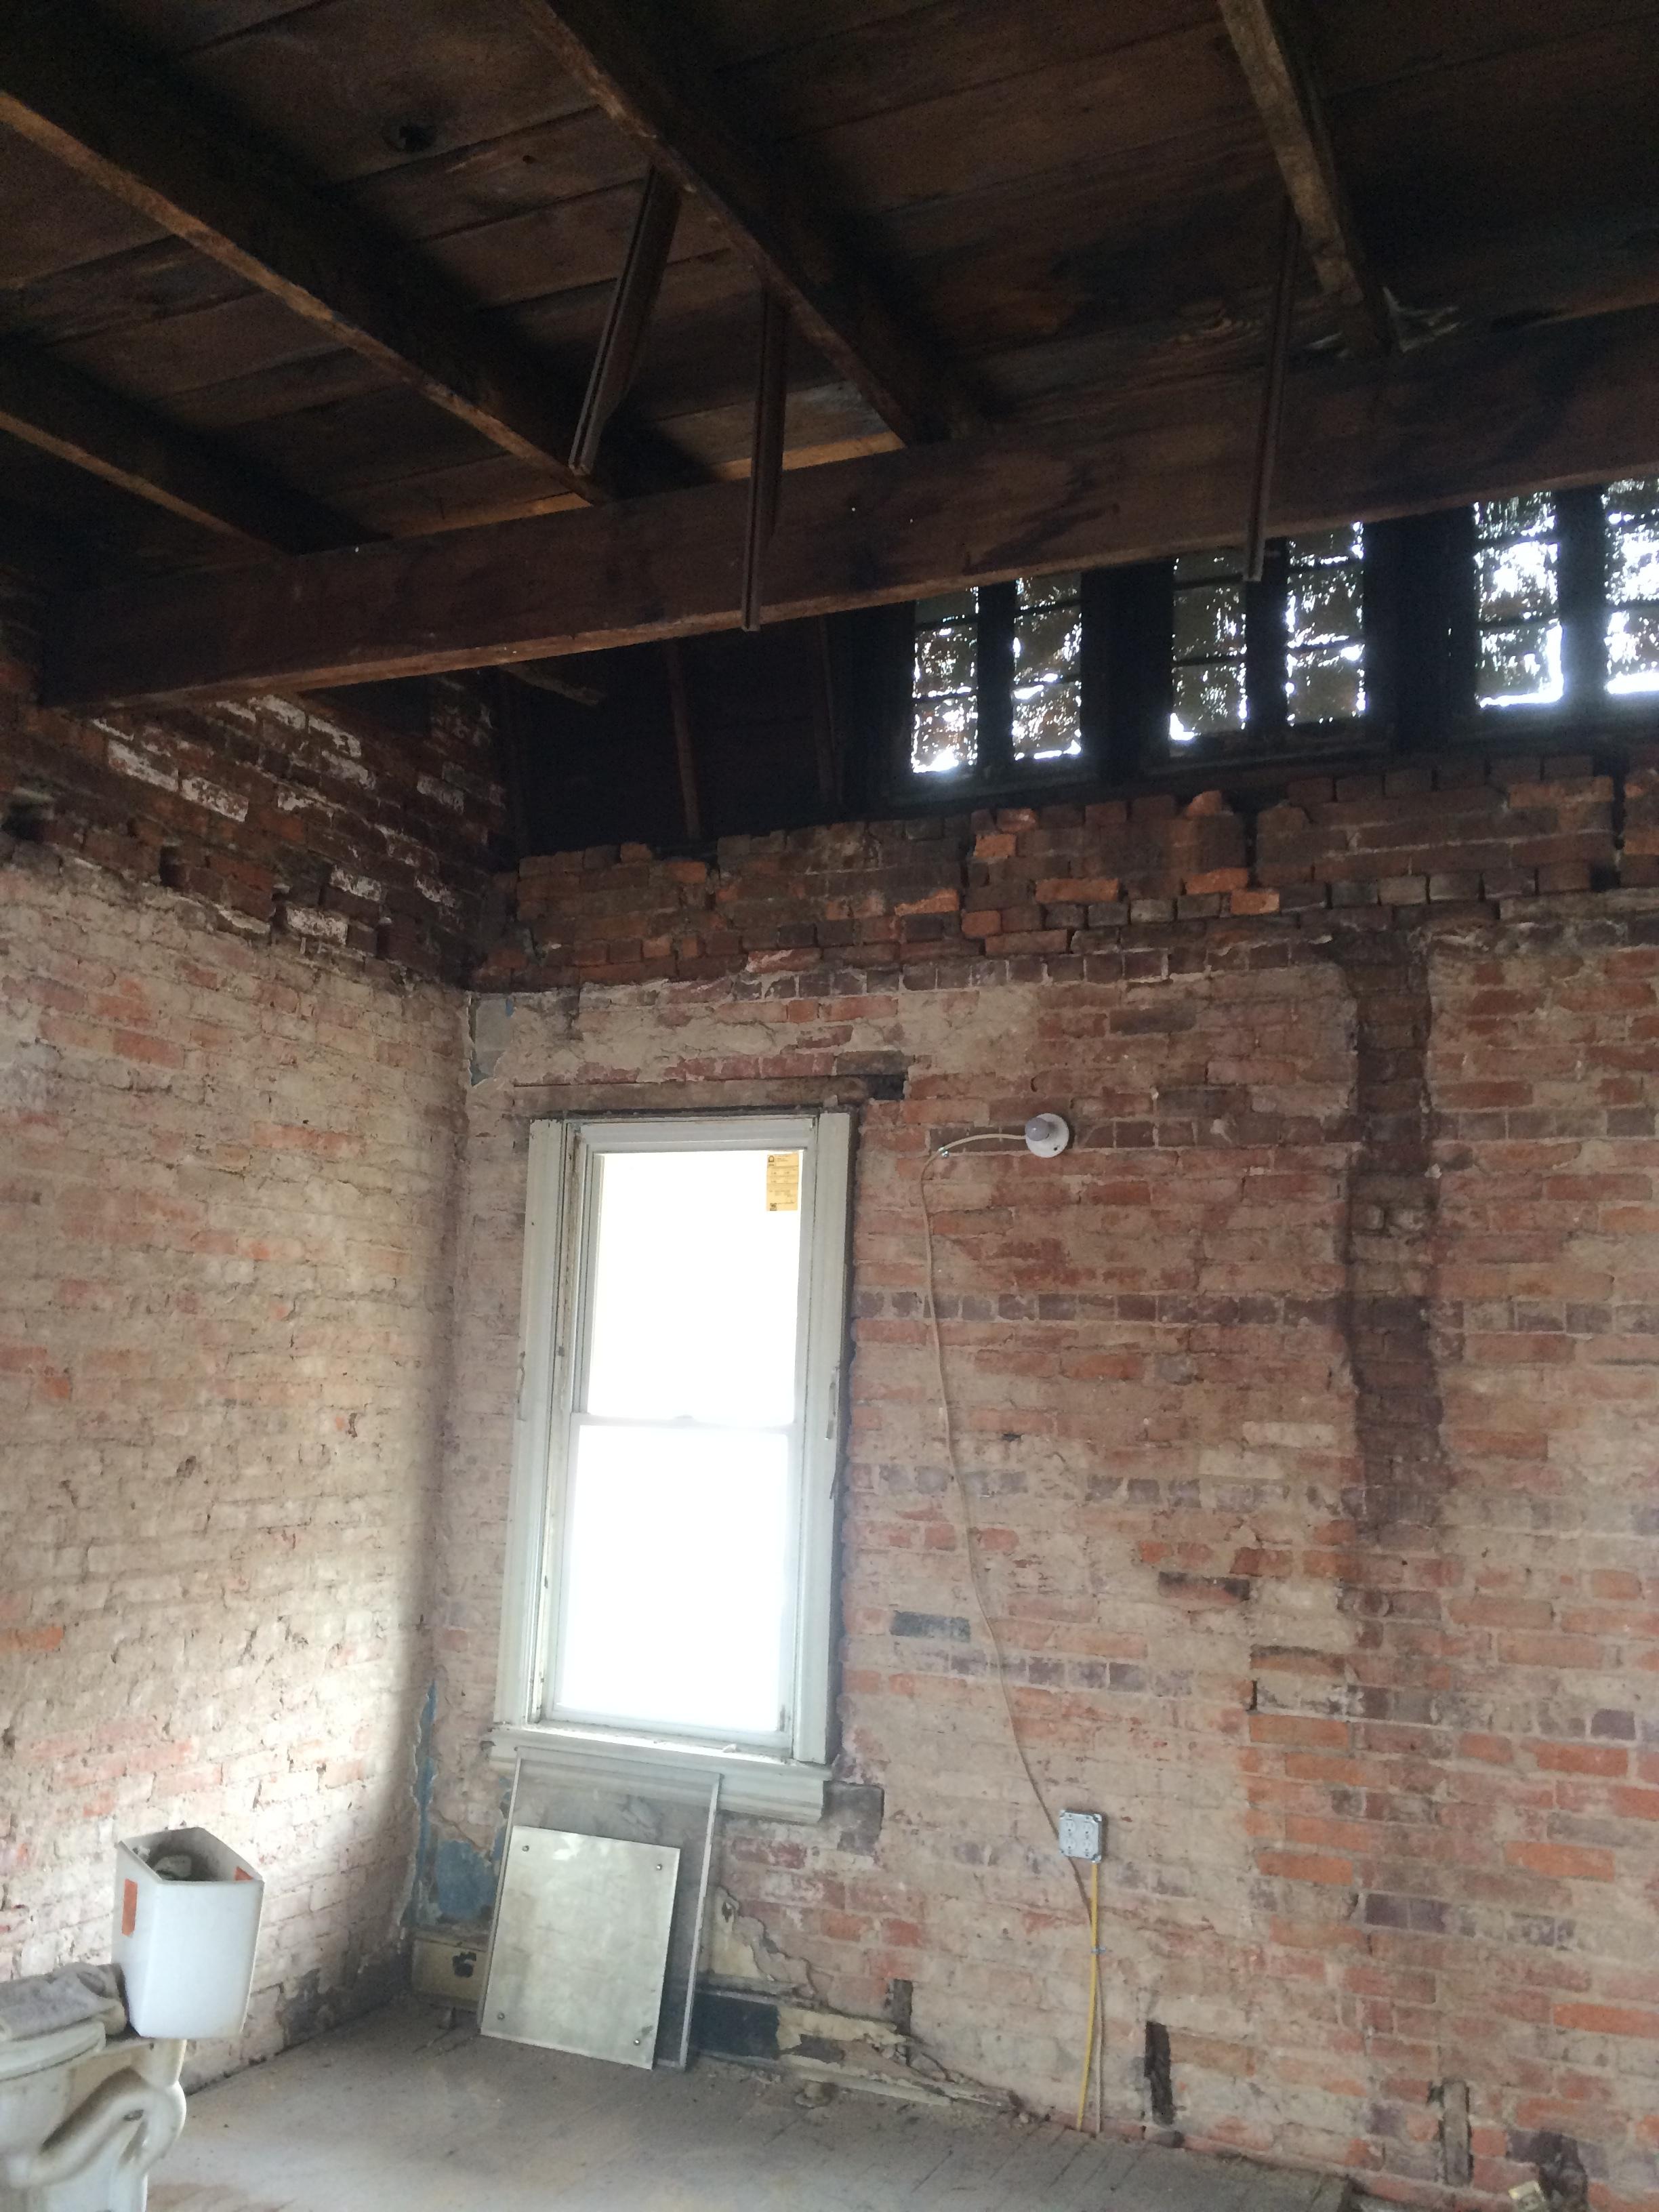 2nd floor after interior demolition